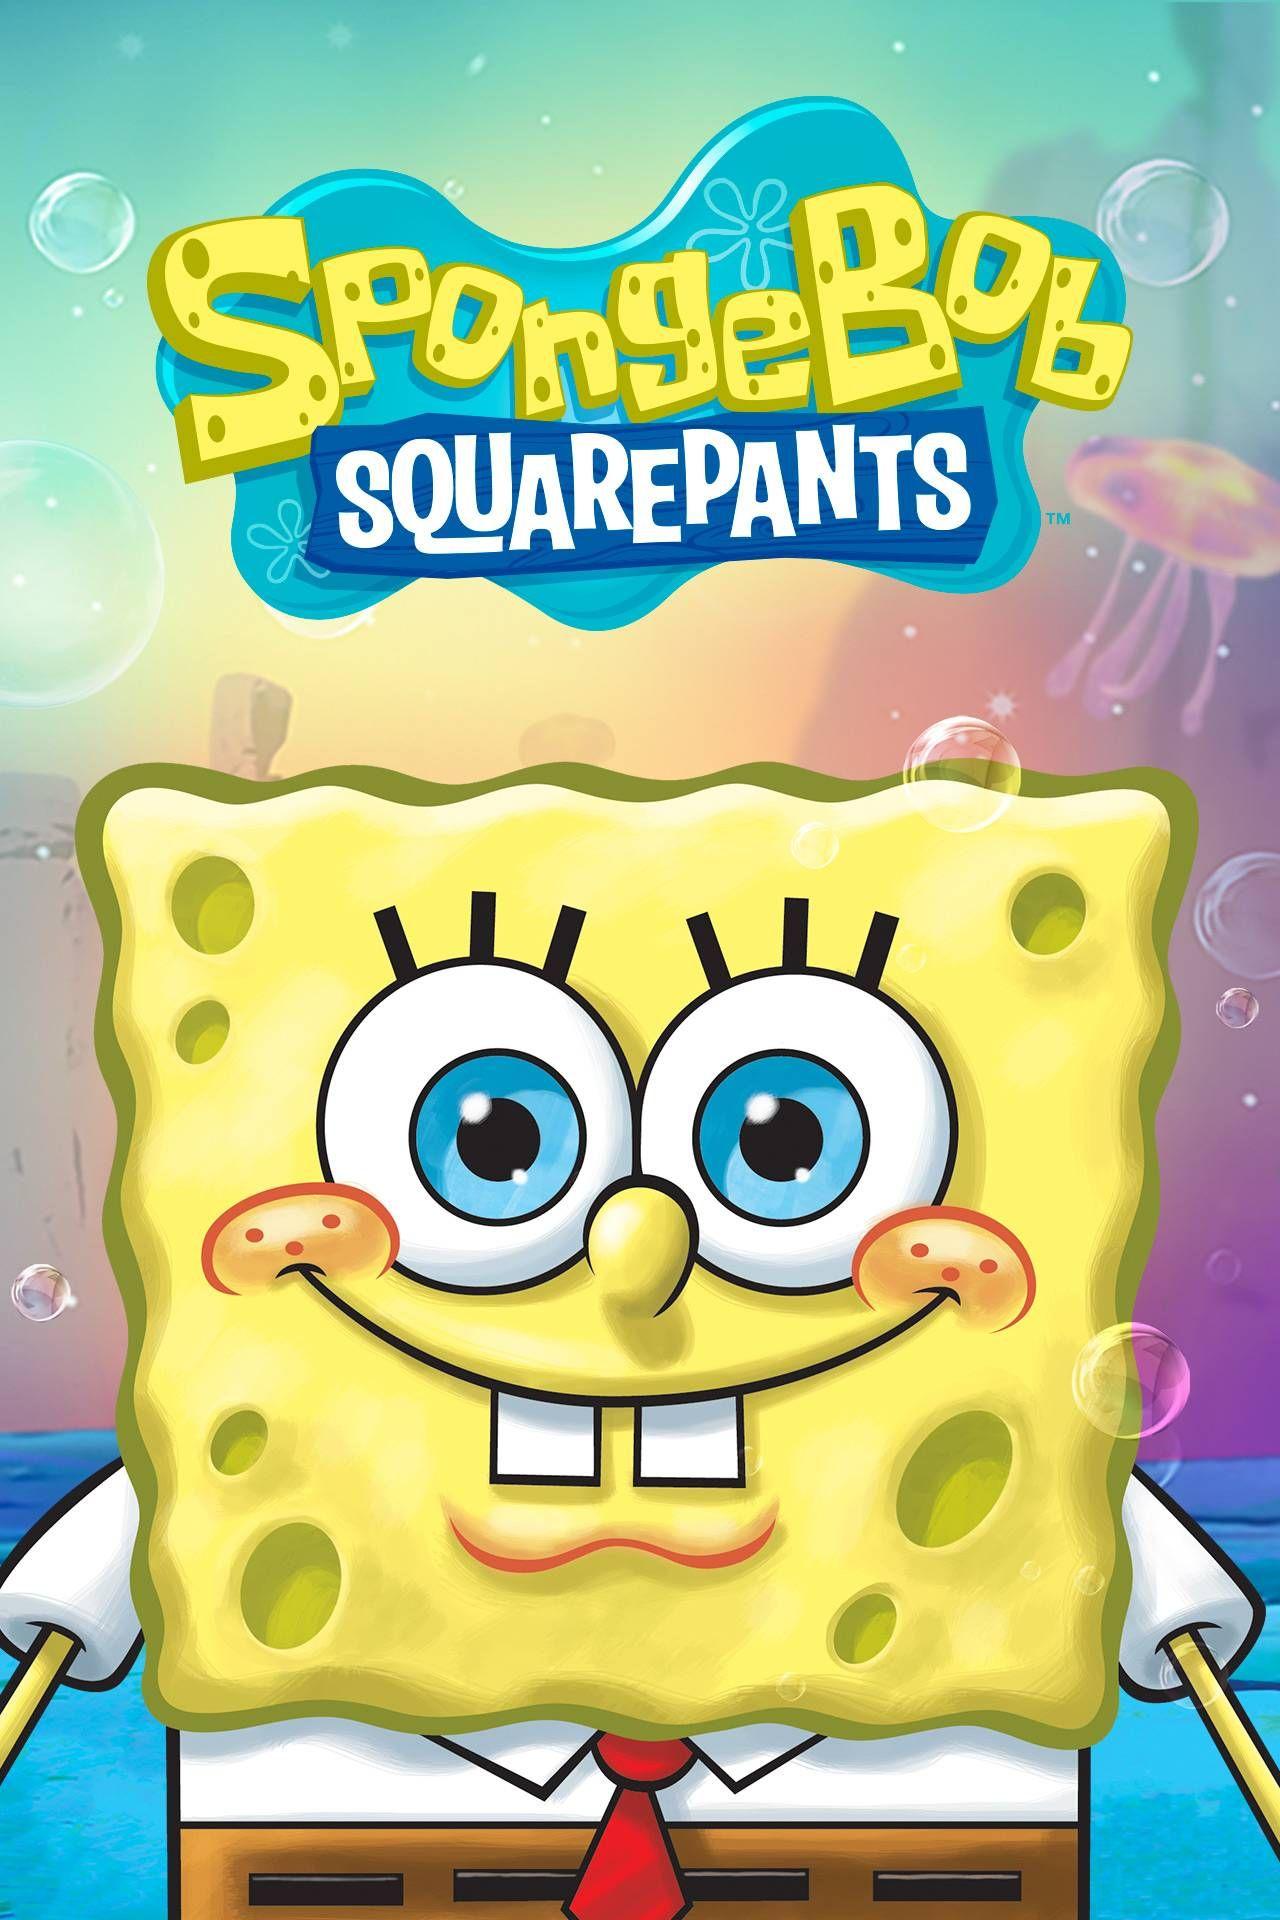 Nickelodeon's 2020-21 New Content is Here! Thanks Nickelodeon!